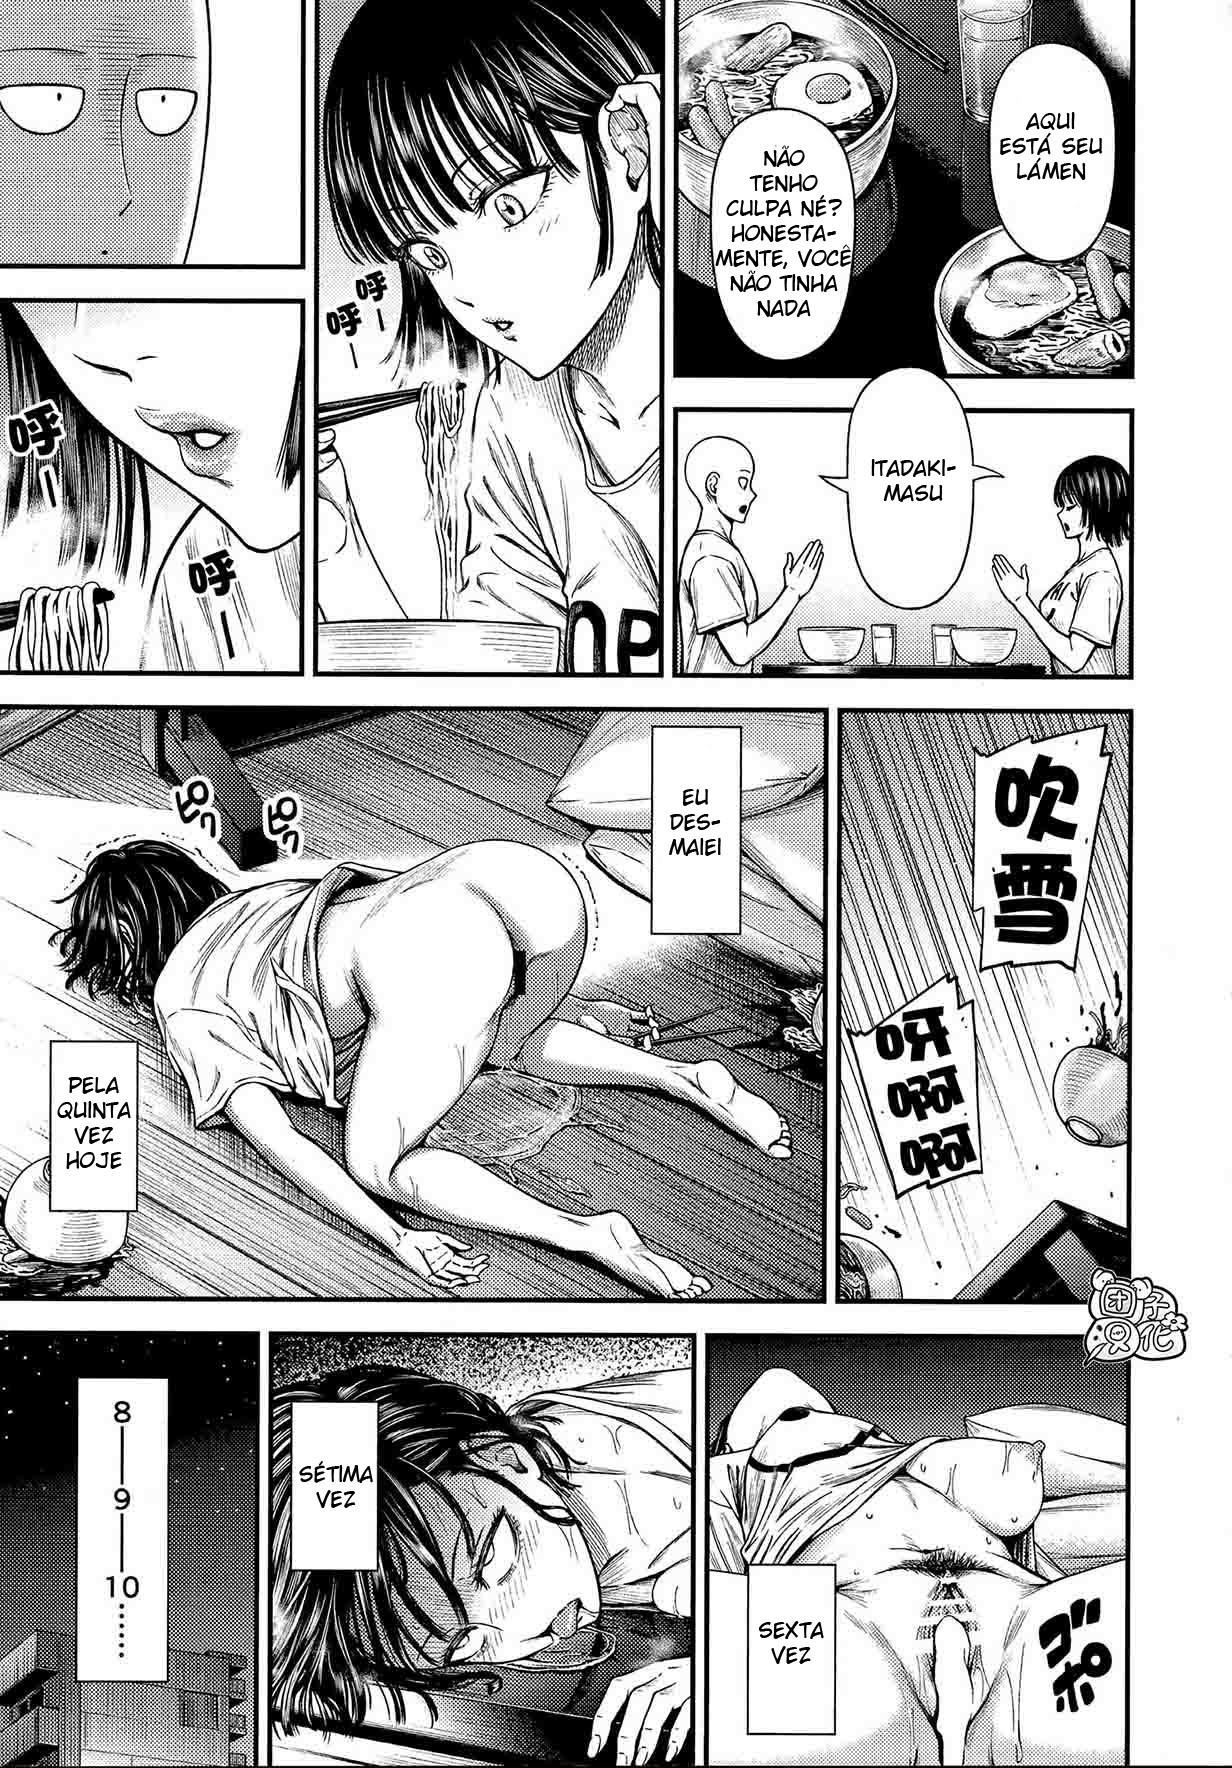 Saitama comendo à Fubuki - Foto 32